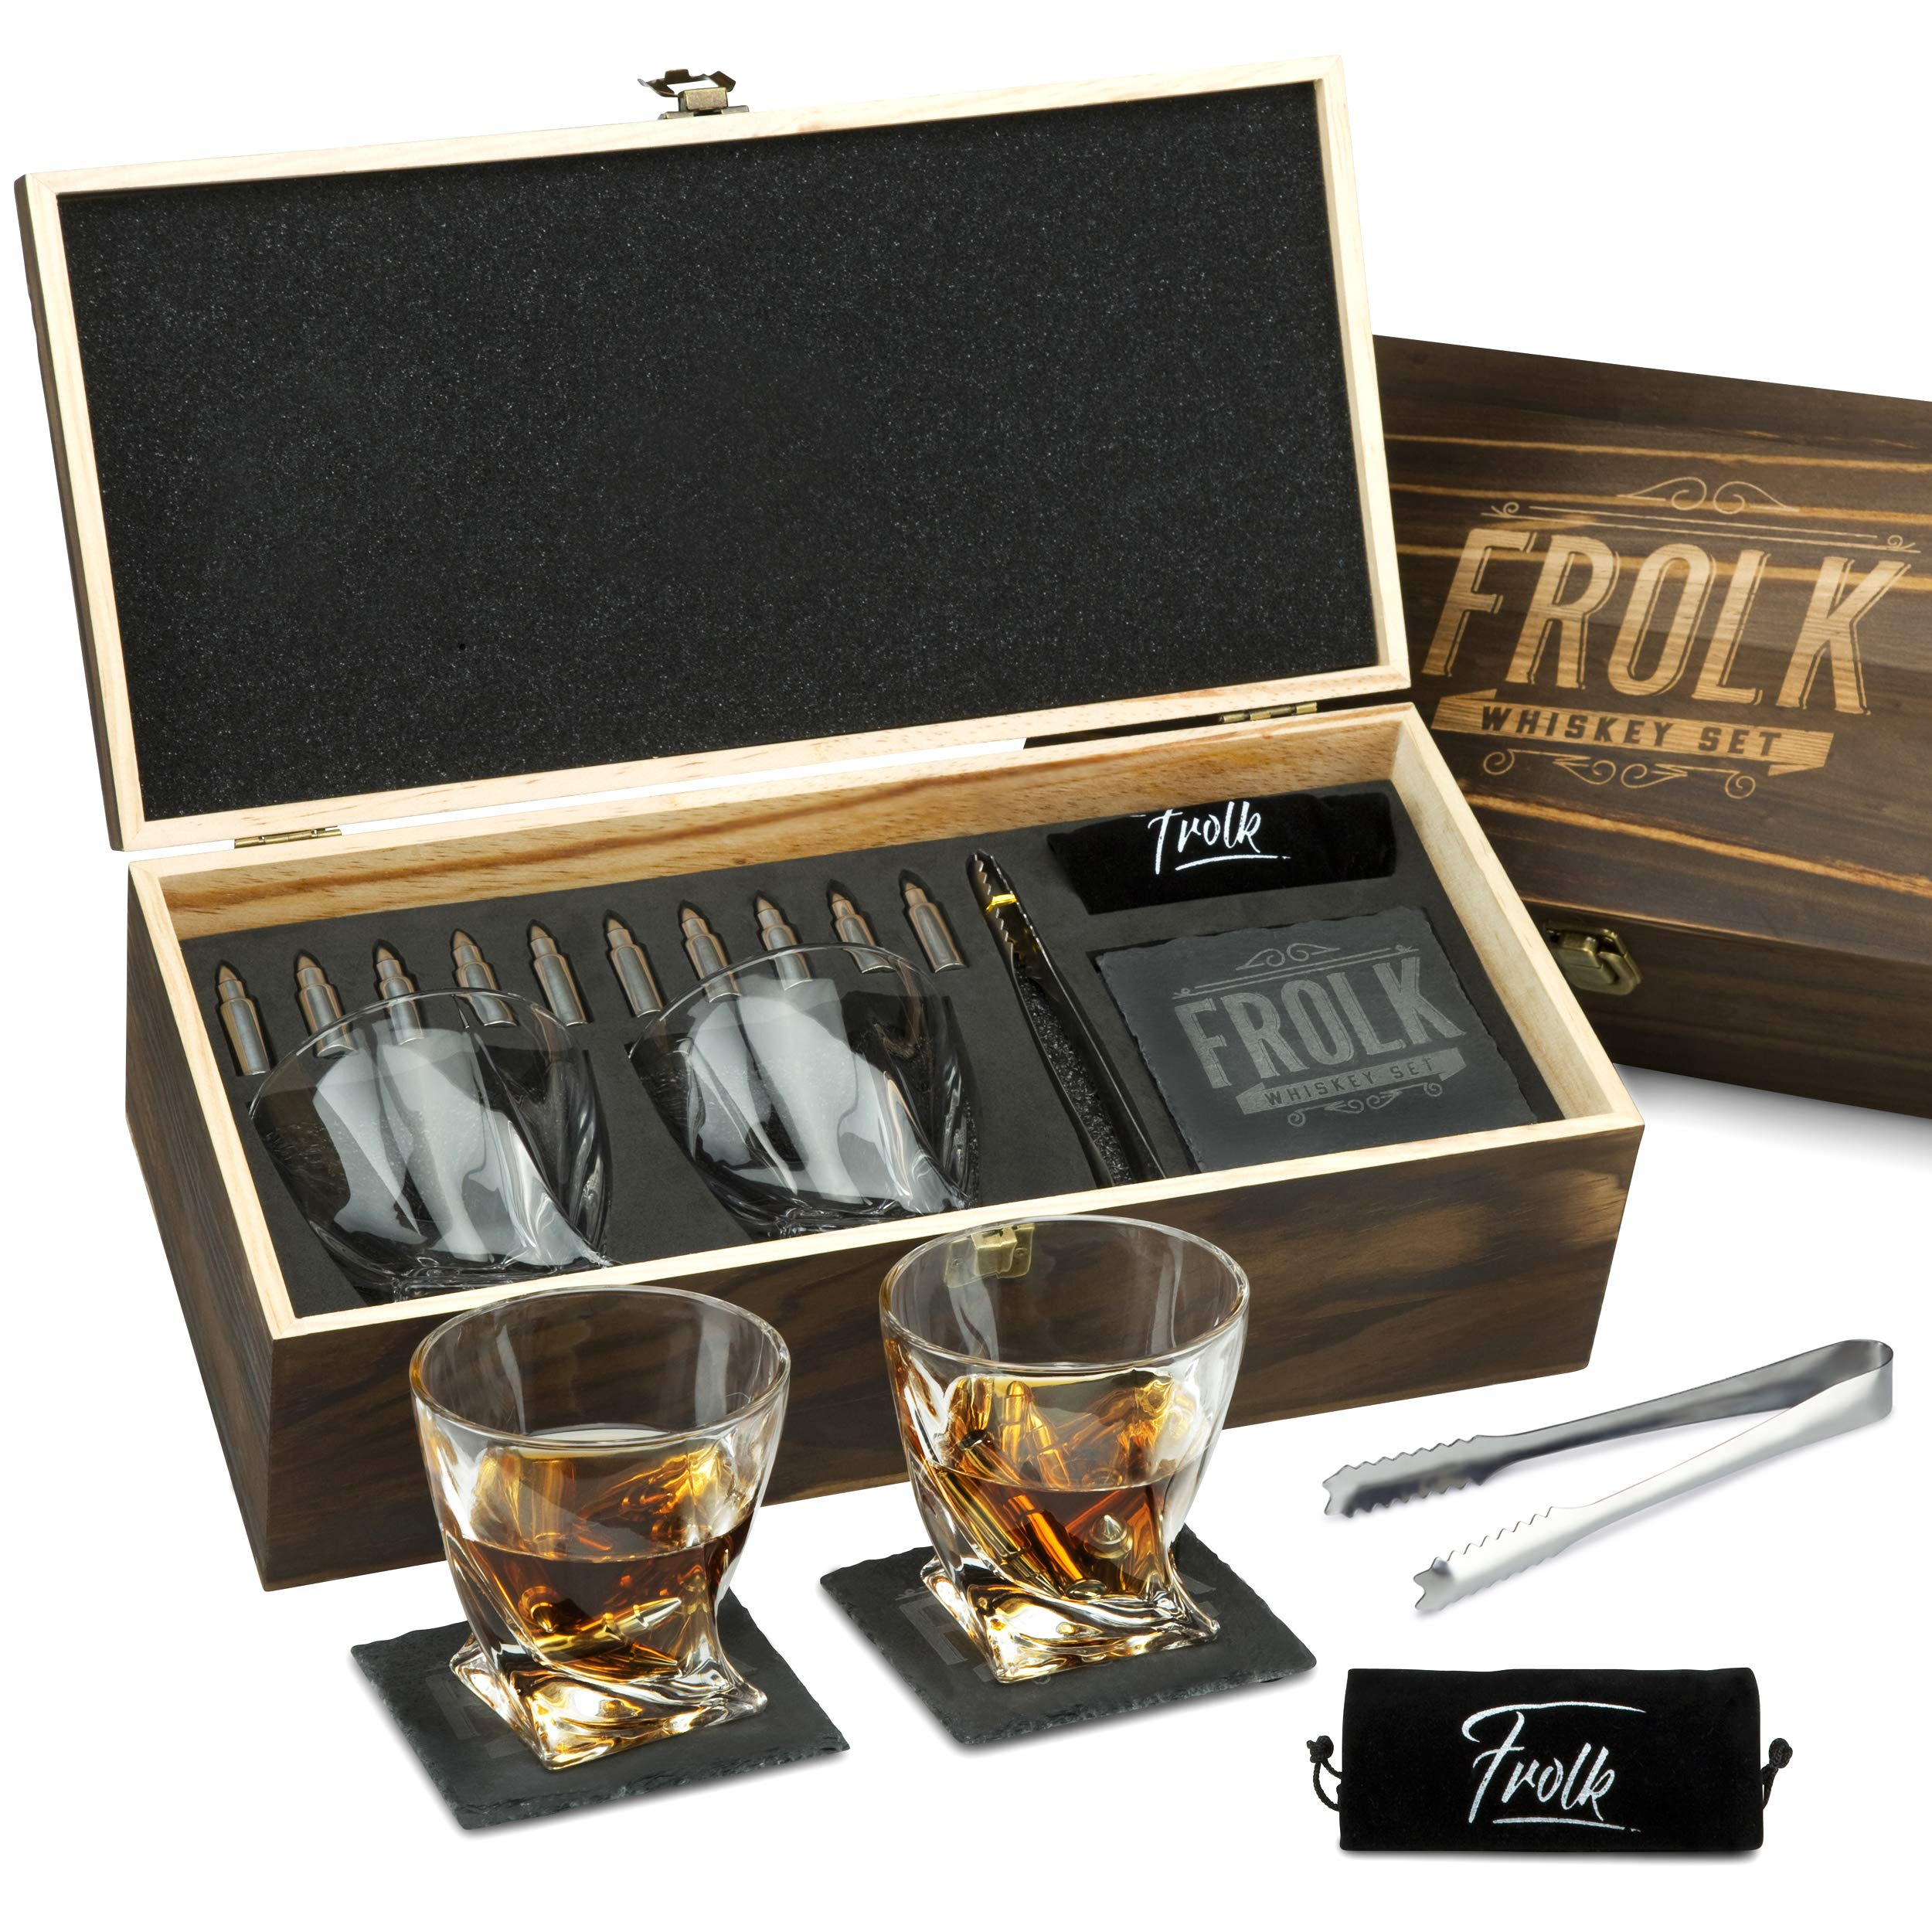 Premium Bullet Shaped Whiskey Stones Gift Set for Men - 10 Bullets Chilling Stainless-Steel Whiskey Rocks - 11 oz 2 Large Twisted Whiskey Glasses, Slate Coasters, Tongs - Premium Set in Pine Wood Box